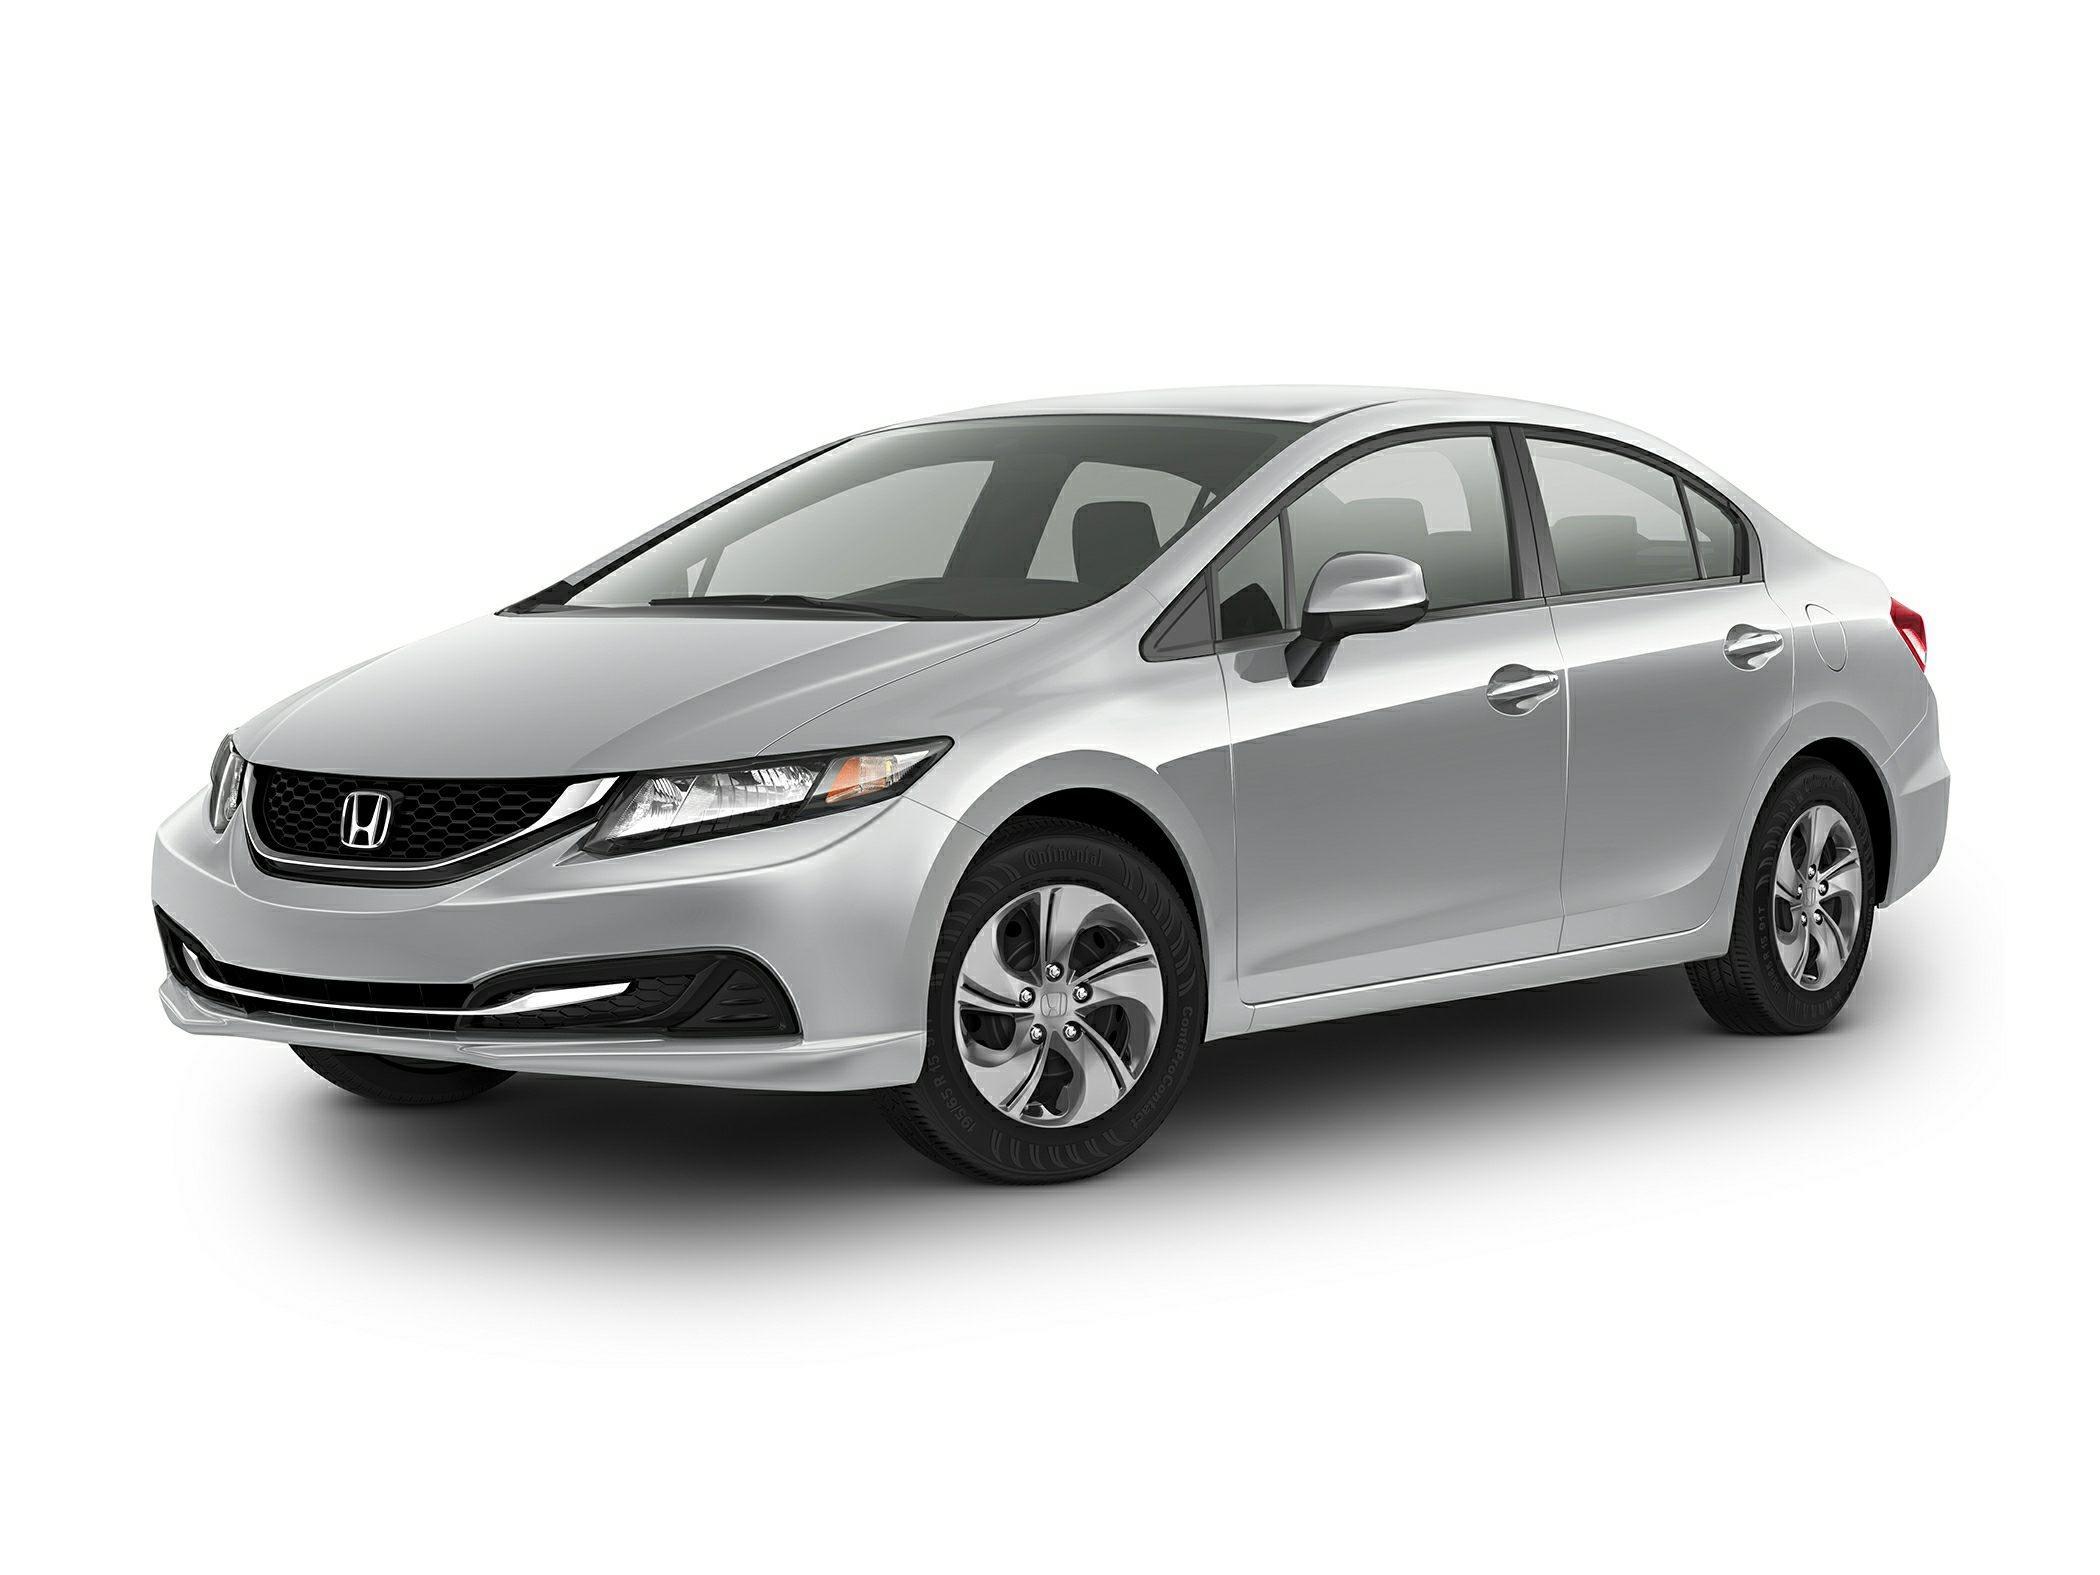 new 2016 honda accord price photos reviews safety ratings cars 2015 honda accord invoice price